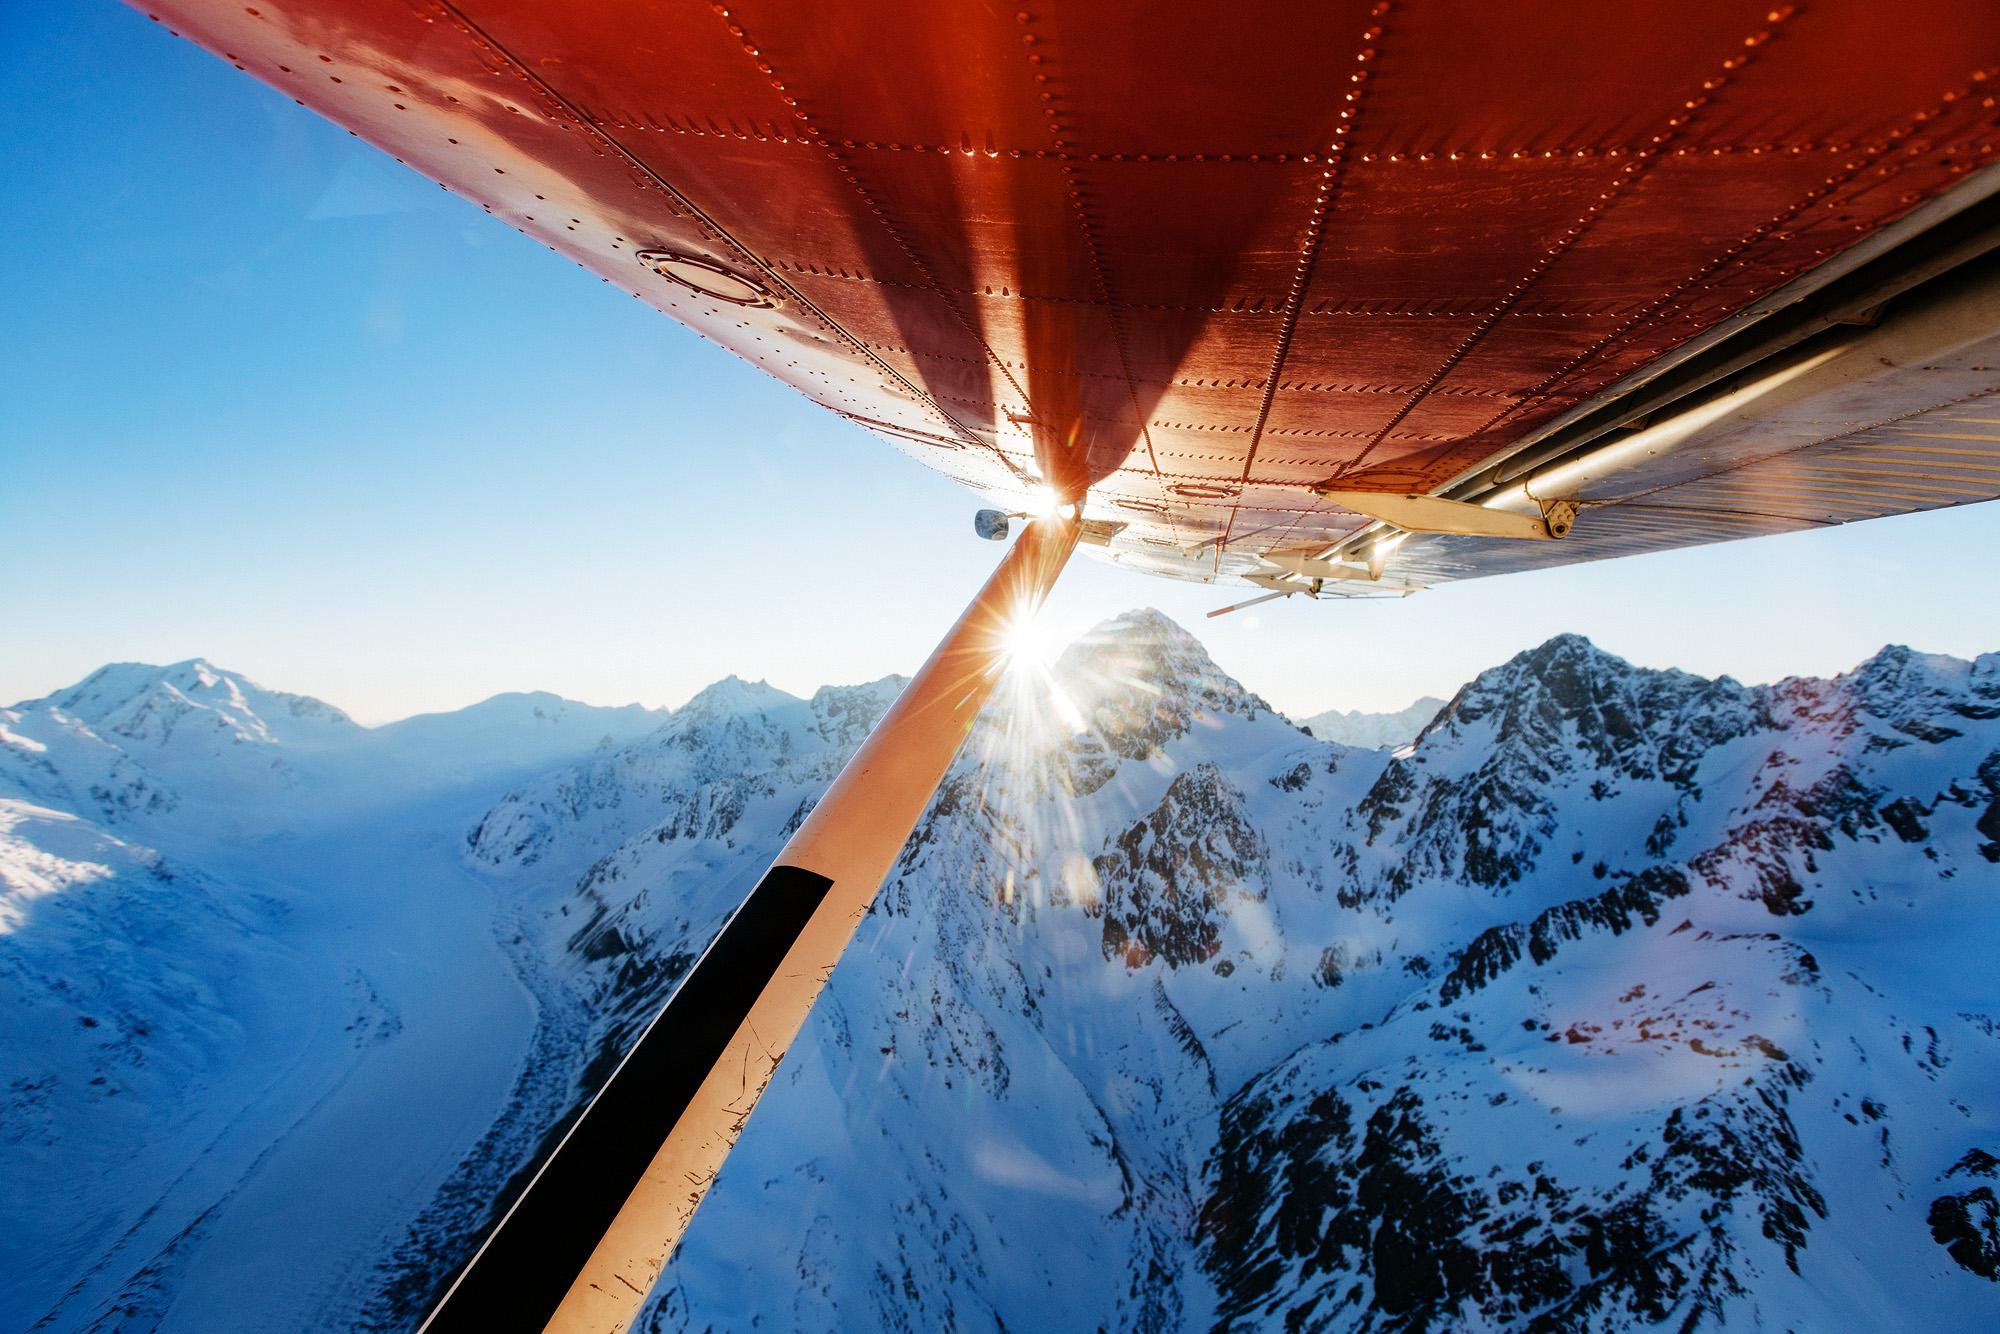 1 Plane New Zealand Mount Cook DSC08518+copy.jpg